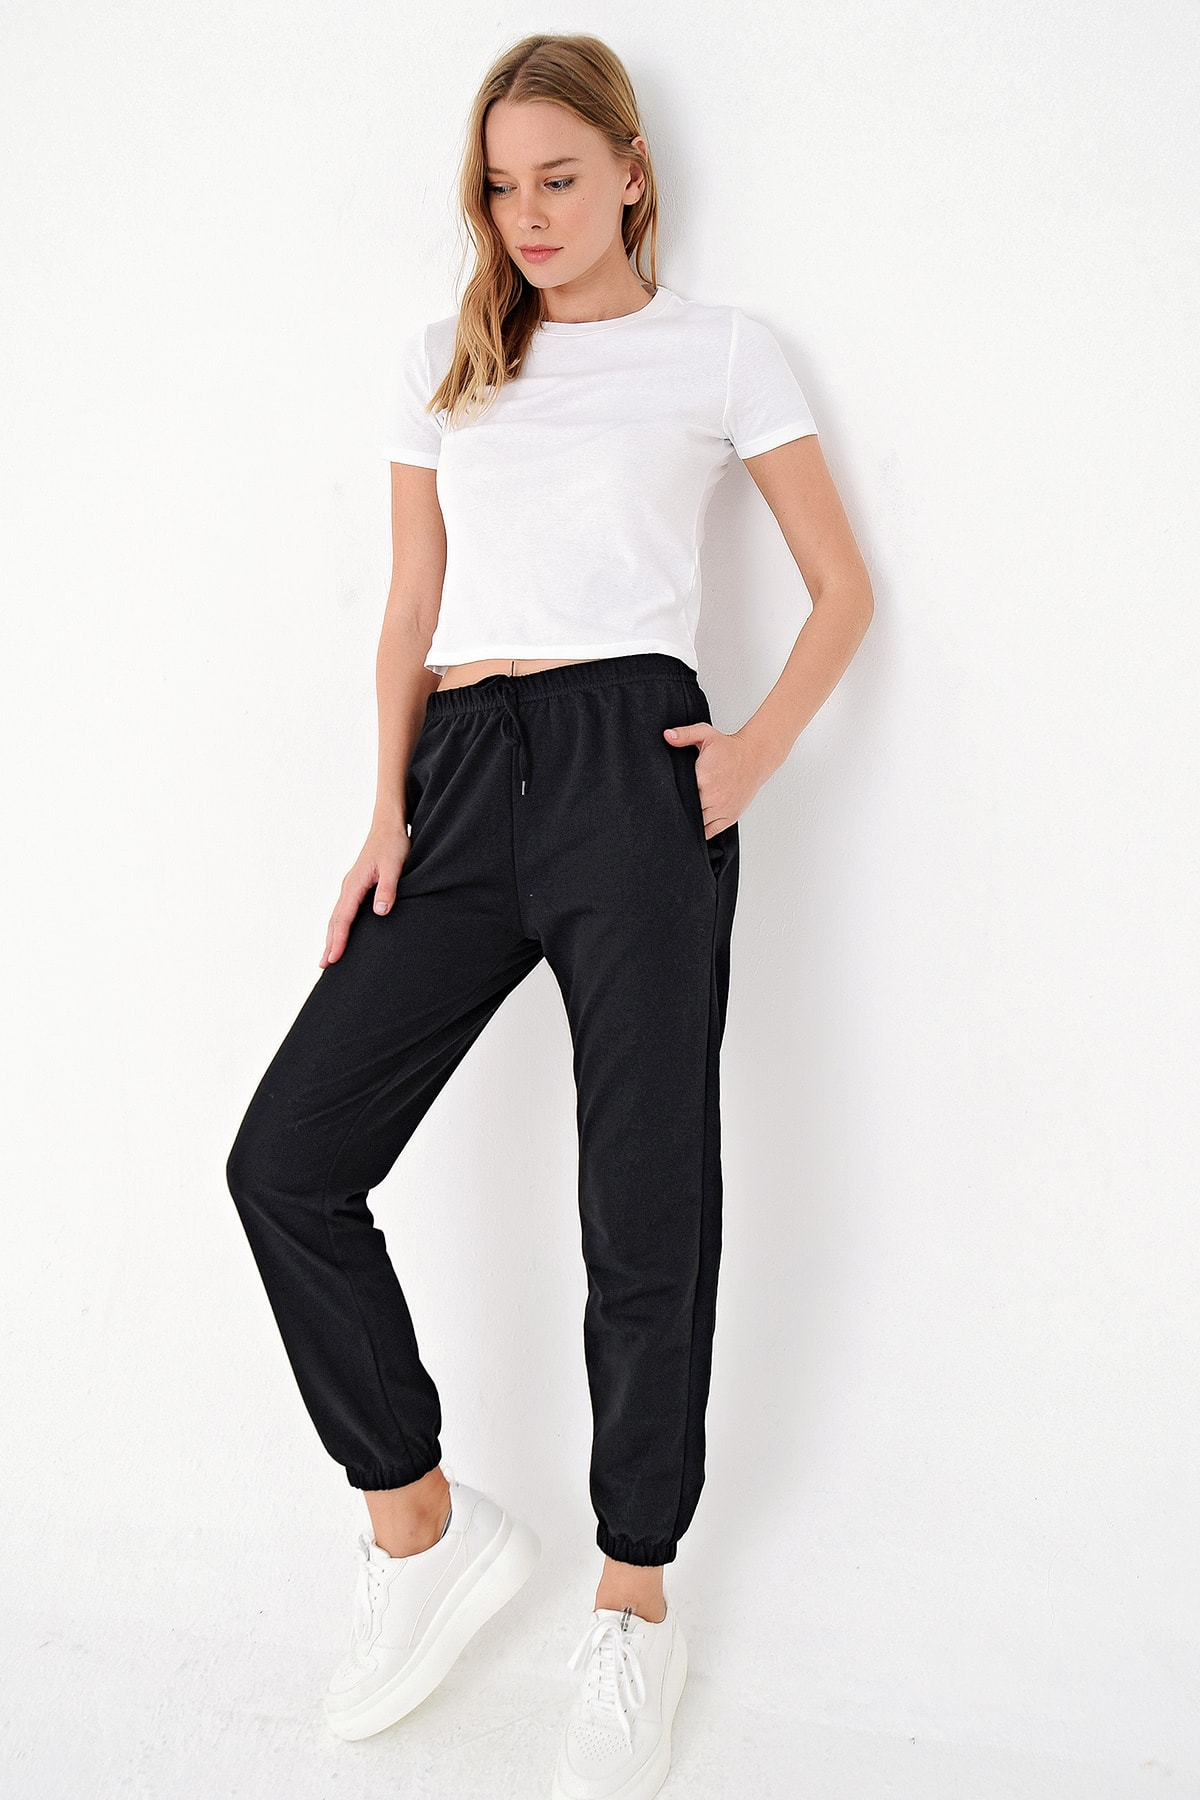 Trend Alaçatı Stili Kadın Siyah Paçası Lastikli İki İplik Eşofman Altı ALC-Y2933 2